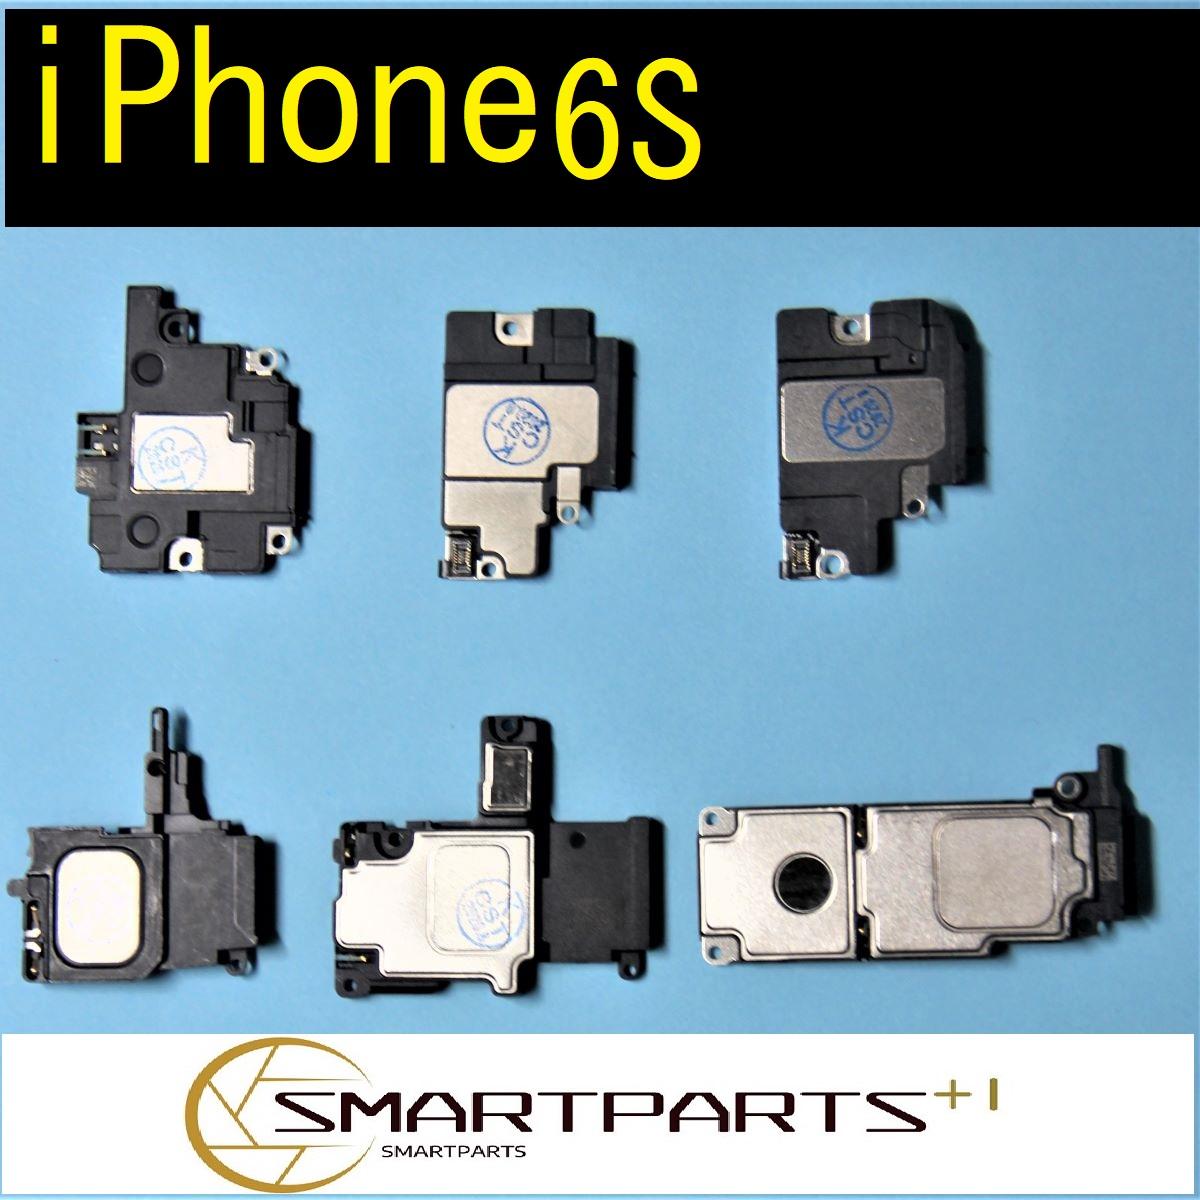 iPhone6Sラウドスピーカー 修理工具セット付き 下部スピーカー 全品送料無料 修理交換パーツ 期間限定特価品 アイフォン リペア部品 DIY修理